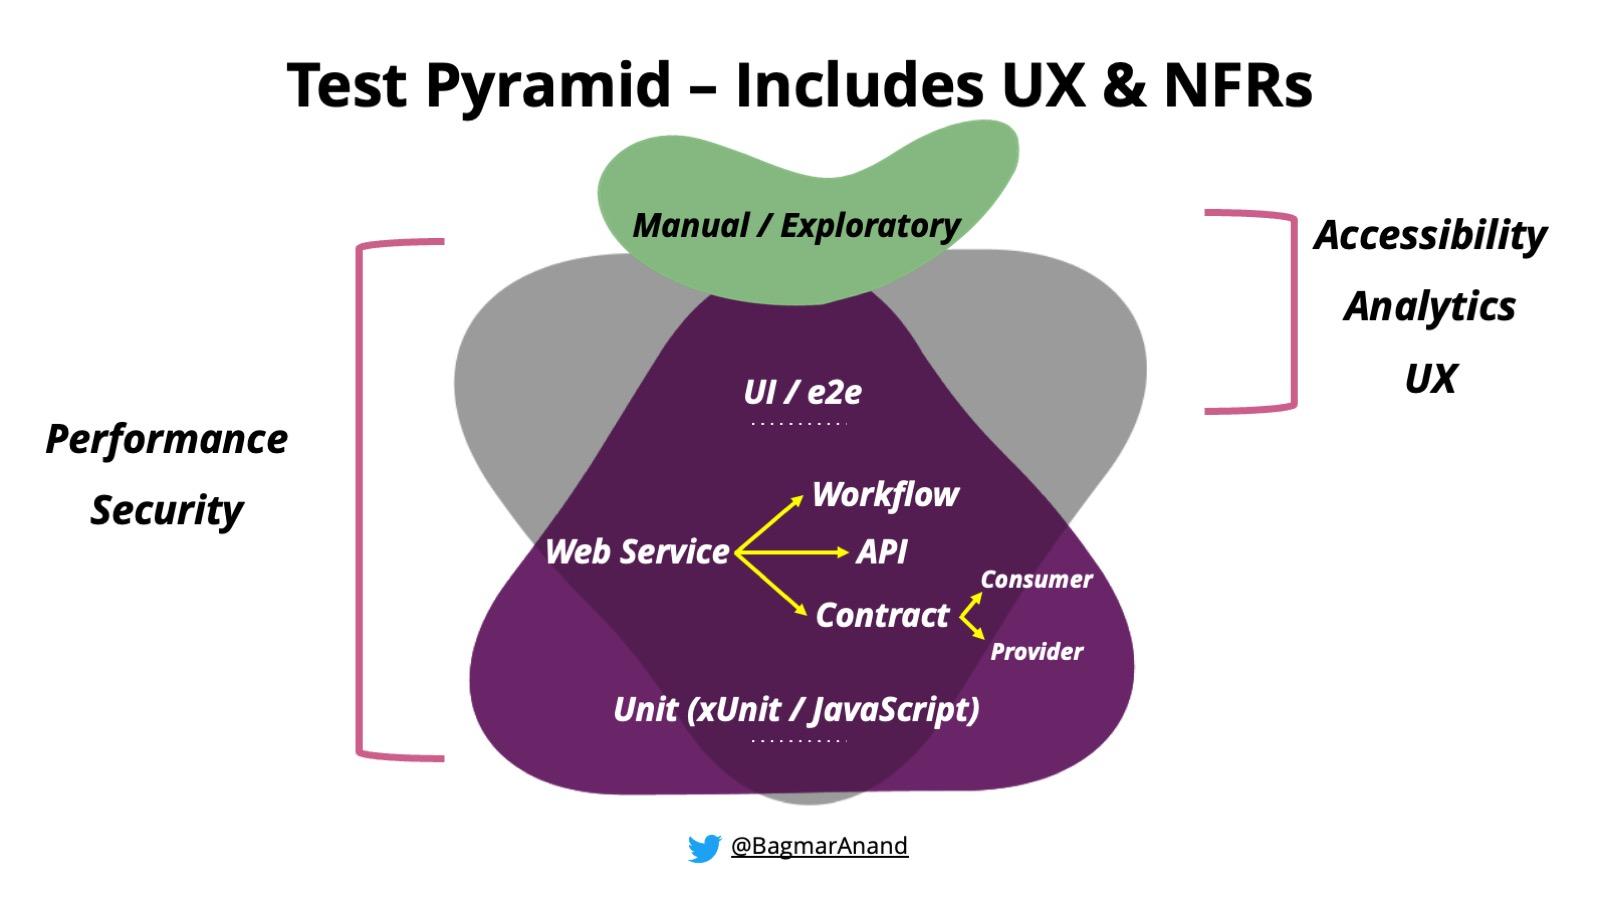 TestPyramid-IncludesUX%2526NFRs.jpeg